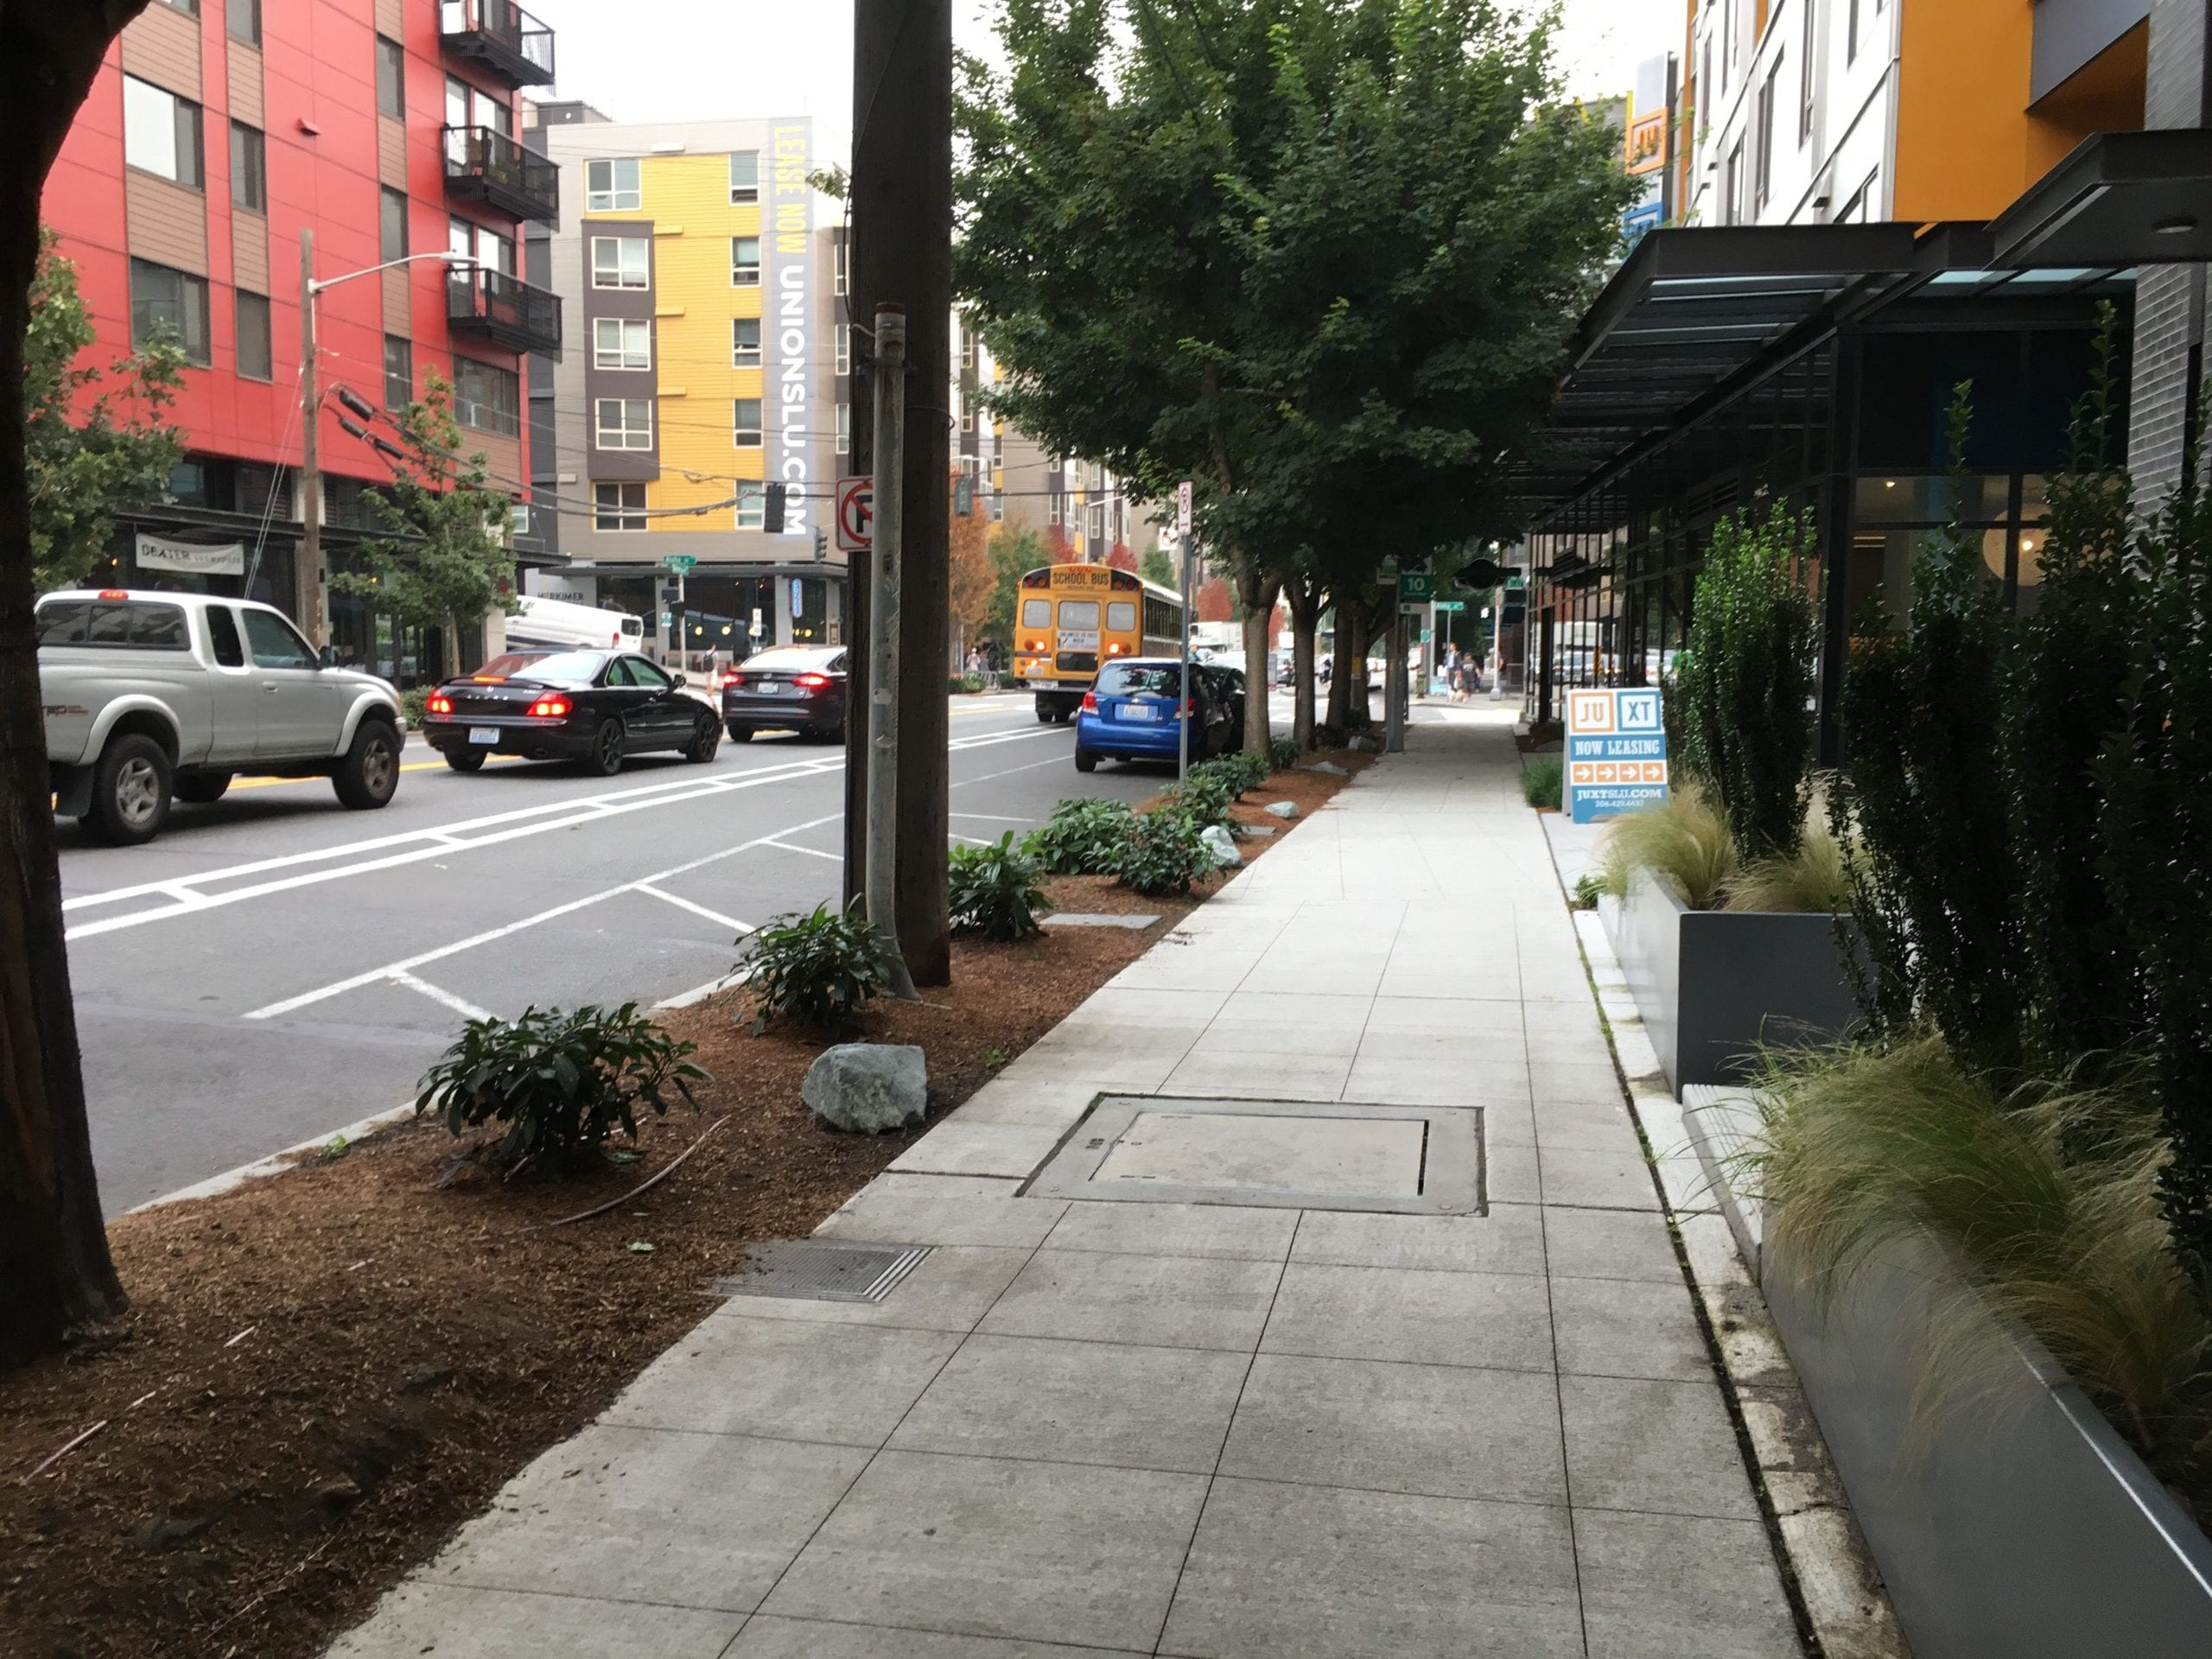 Dexter Avenue North